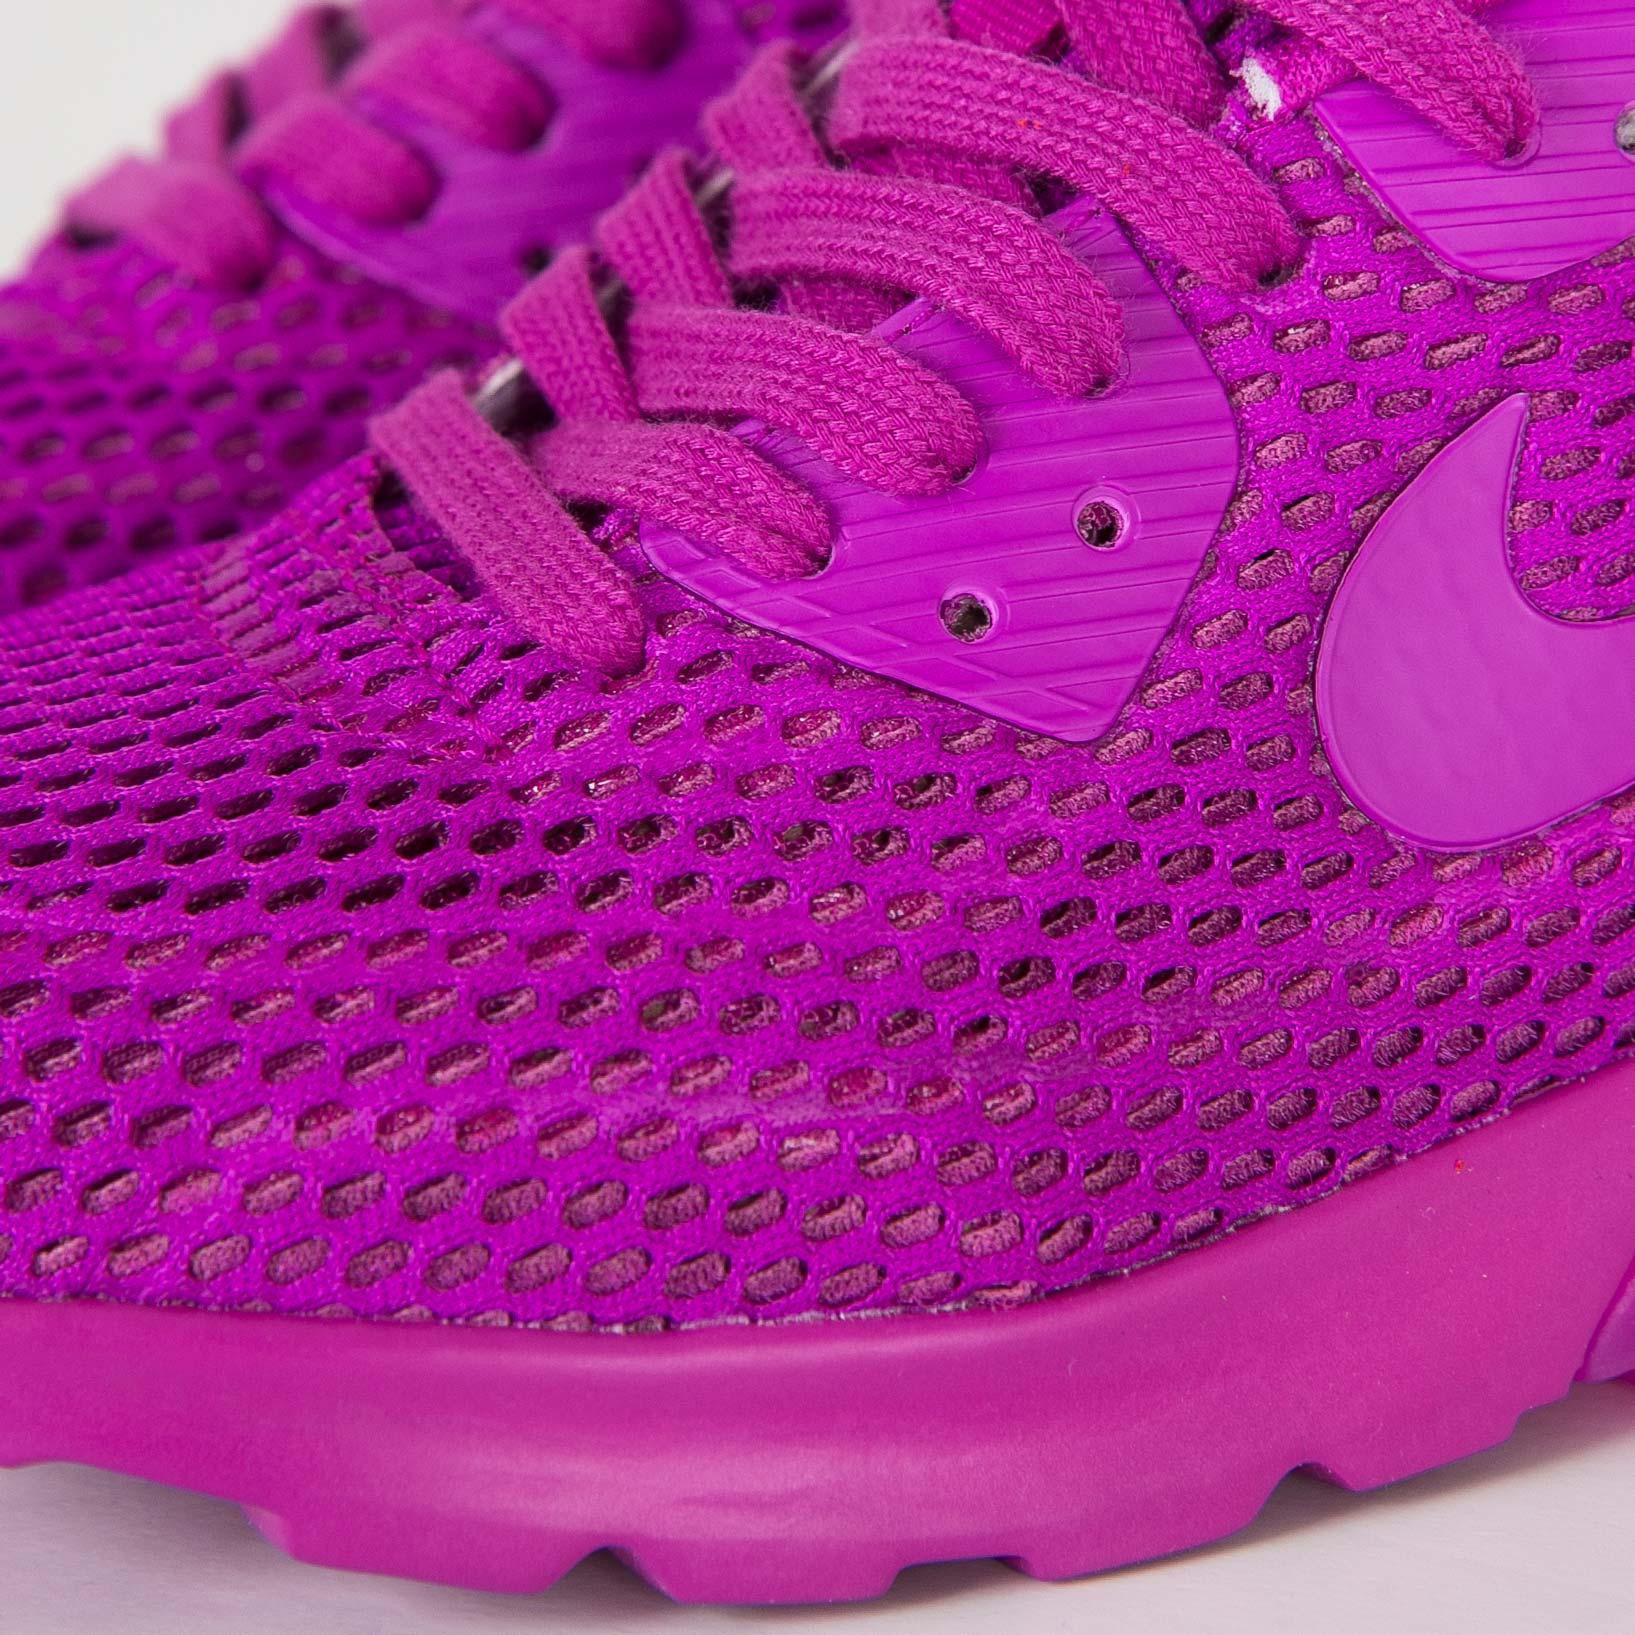 Nike W Air Max 90 Ultra BR 725061 500 Sneakersnstuff